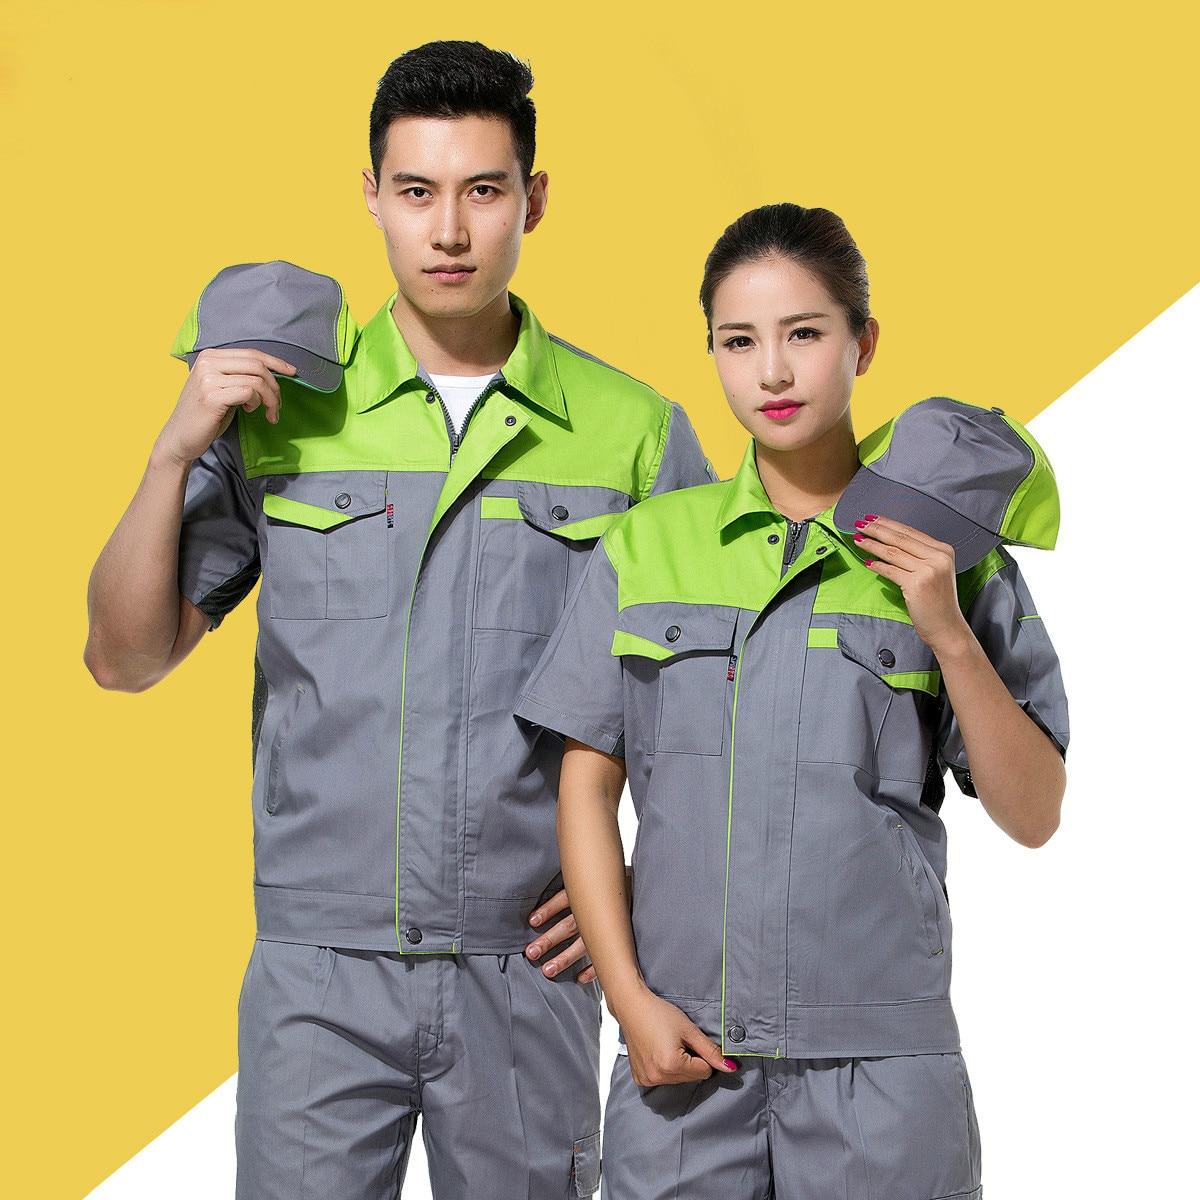 Unisex Short Sleeve Summer Engineering Uniforms Work Wear Clothing Auto Repair Workshop Suit Set Zipper Jackets Long Pants